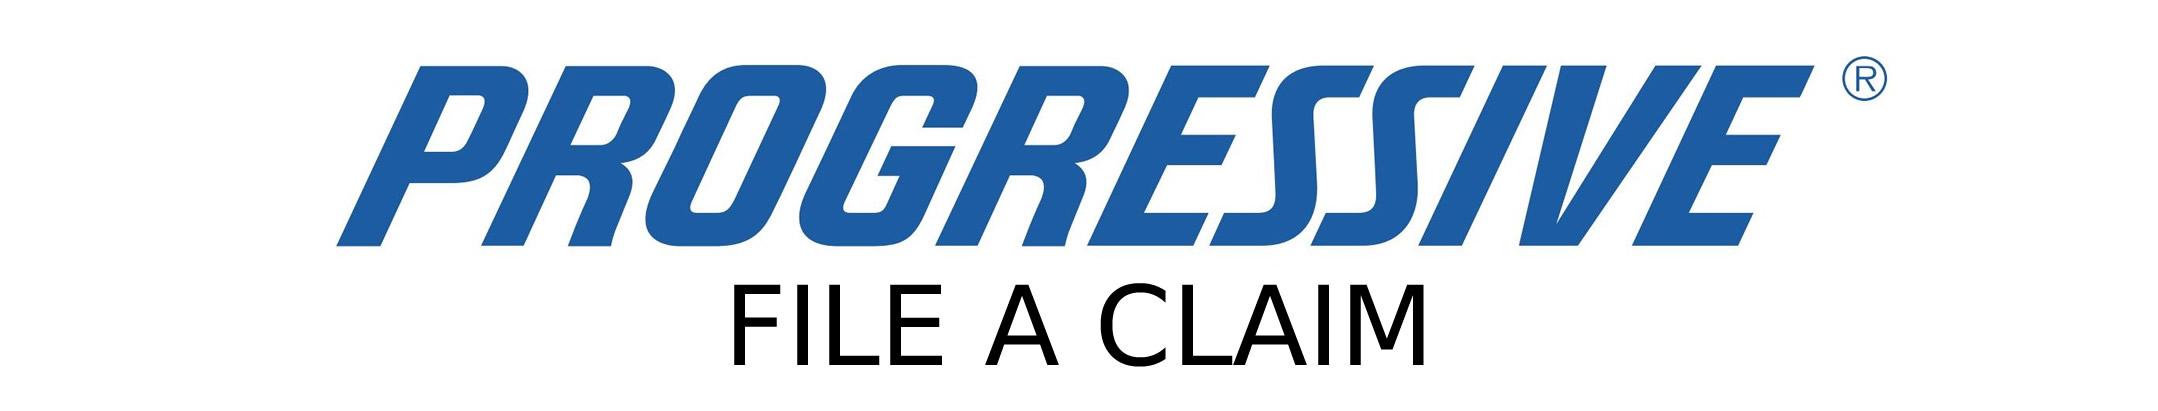 progressive_file_a_claim